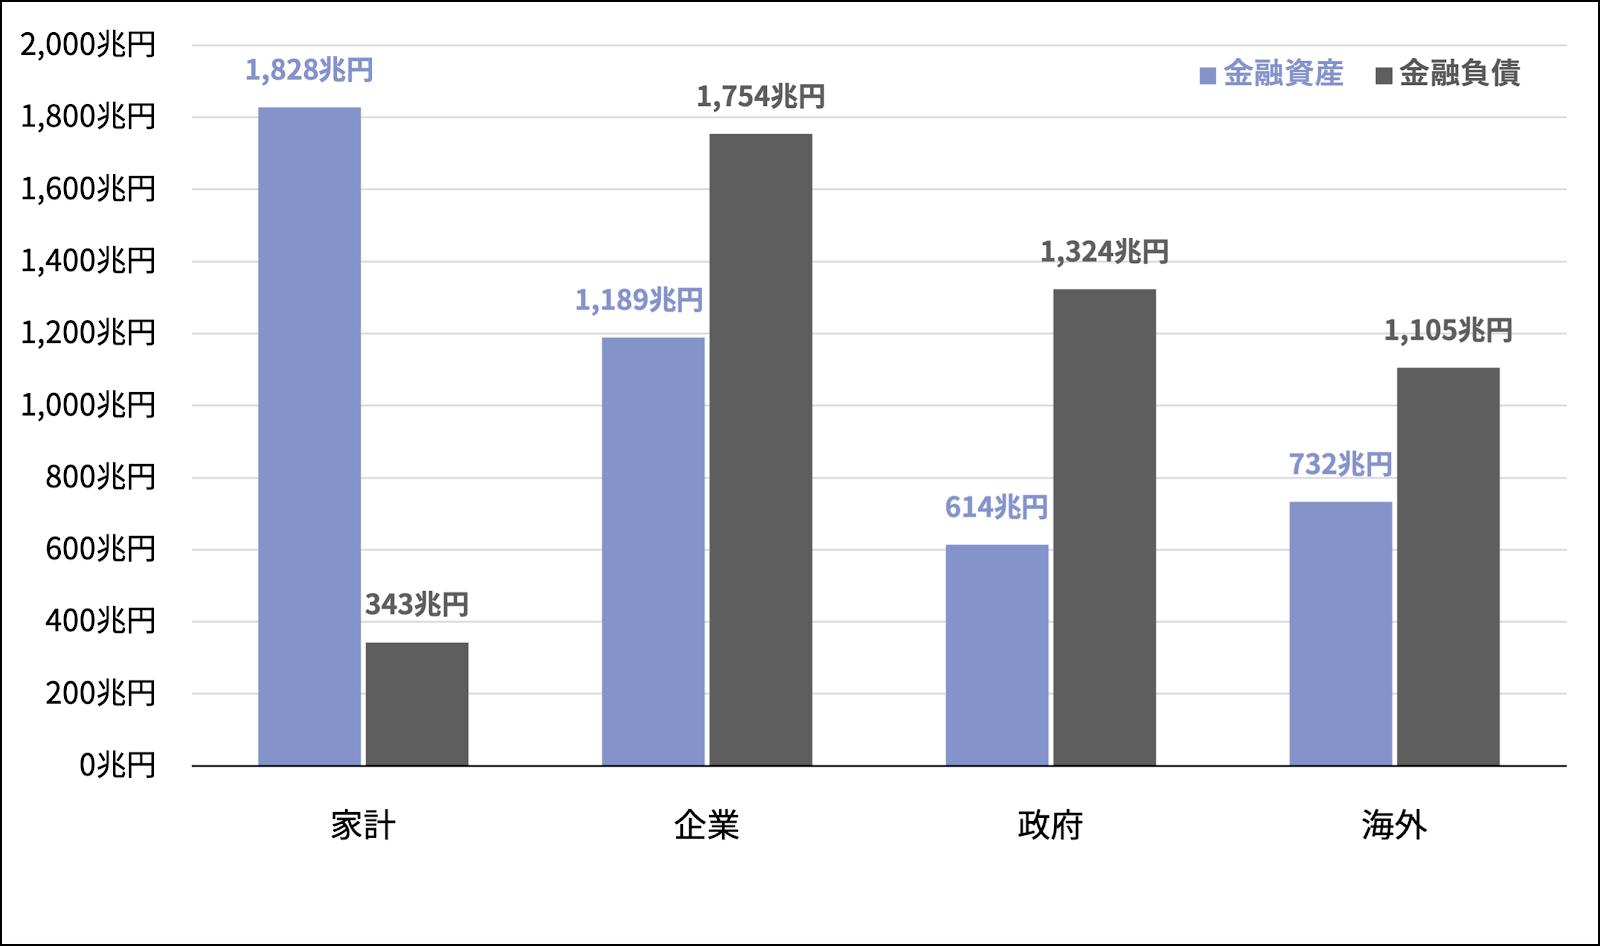 図1 各部門の金融資産・負債の残高(2020年3月末)[出所:日本銀行「資金循環統計」を元に筆者作成]